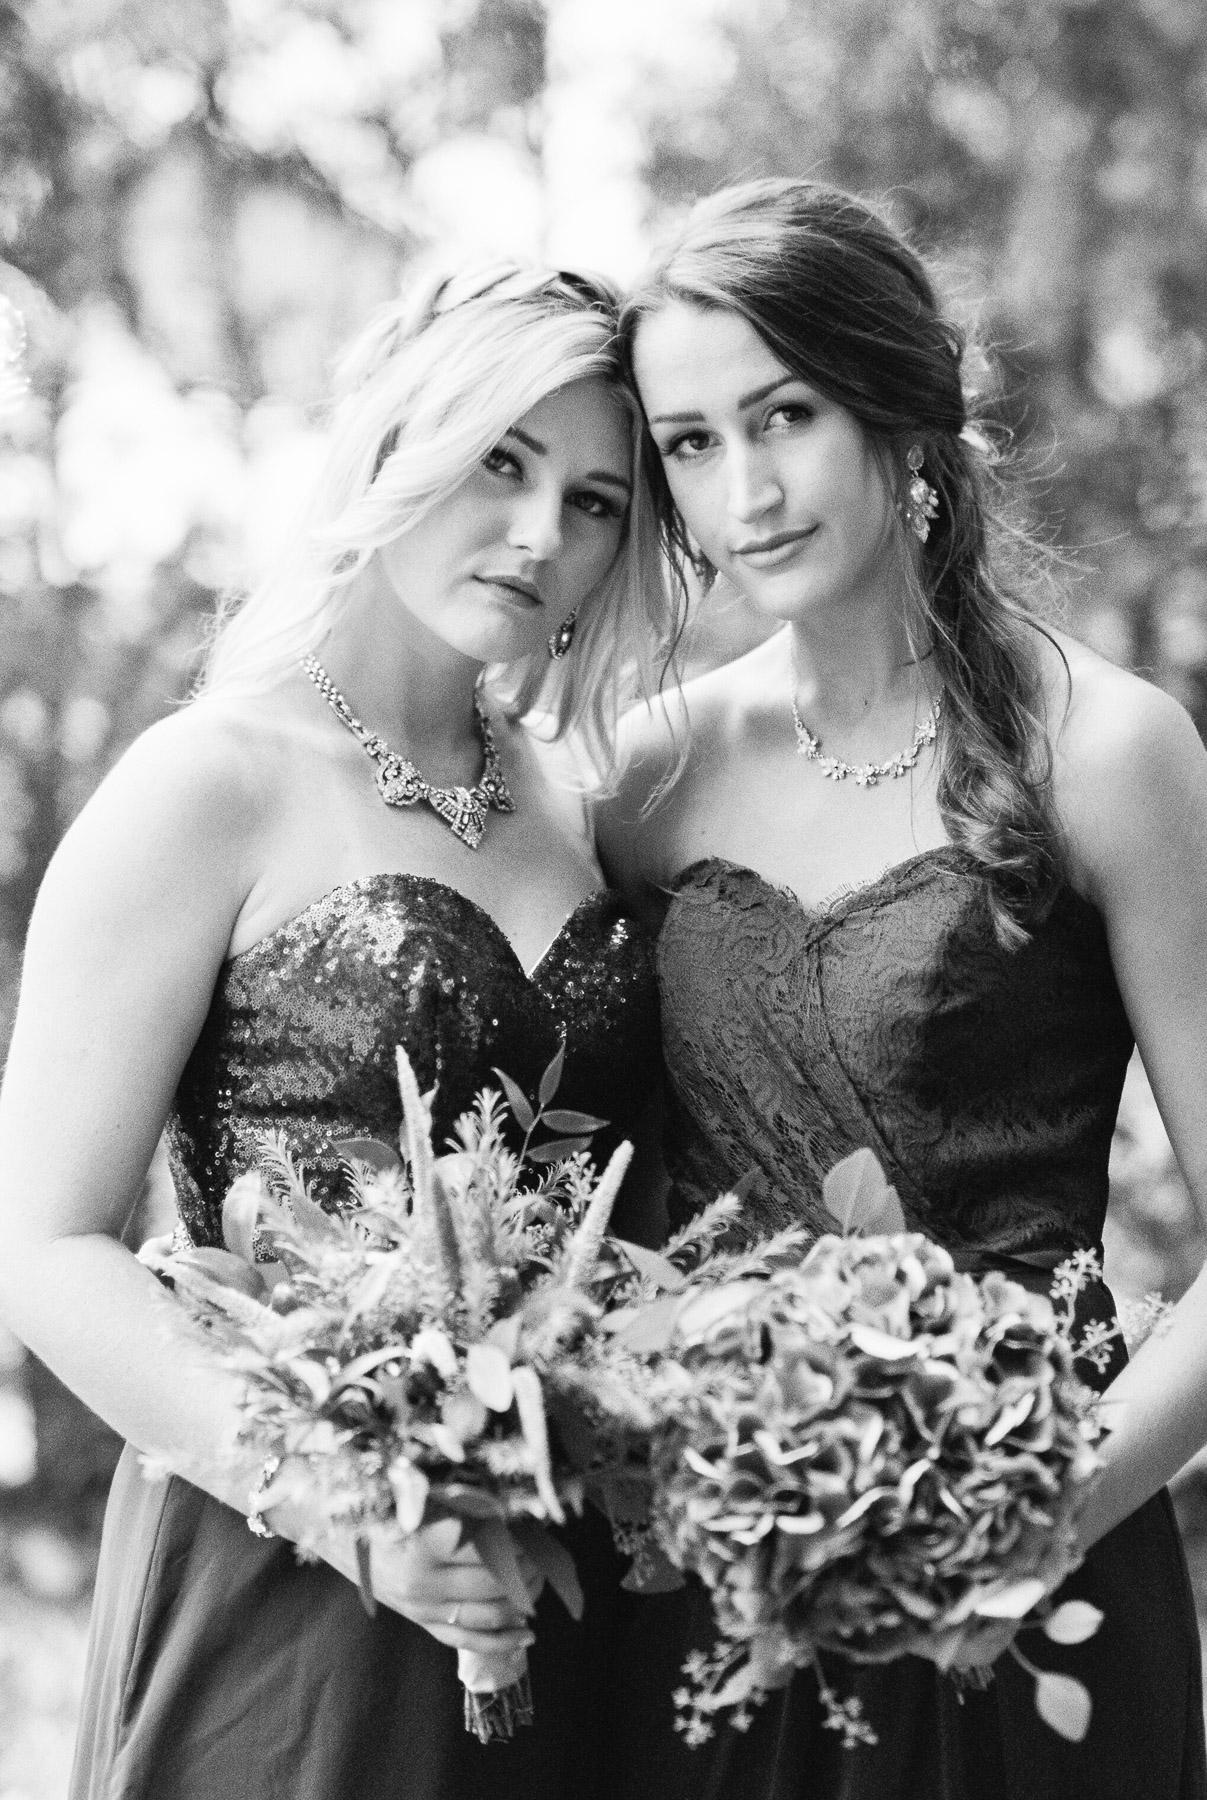 KateTaramykinStudios-Portfolio-Weddings-LuxmoreGrande-4.jpg